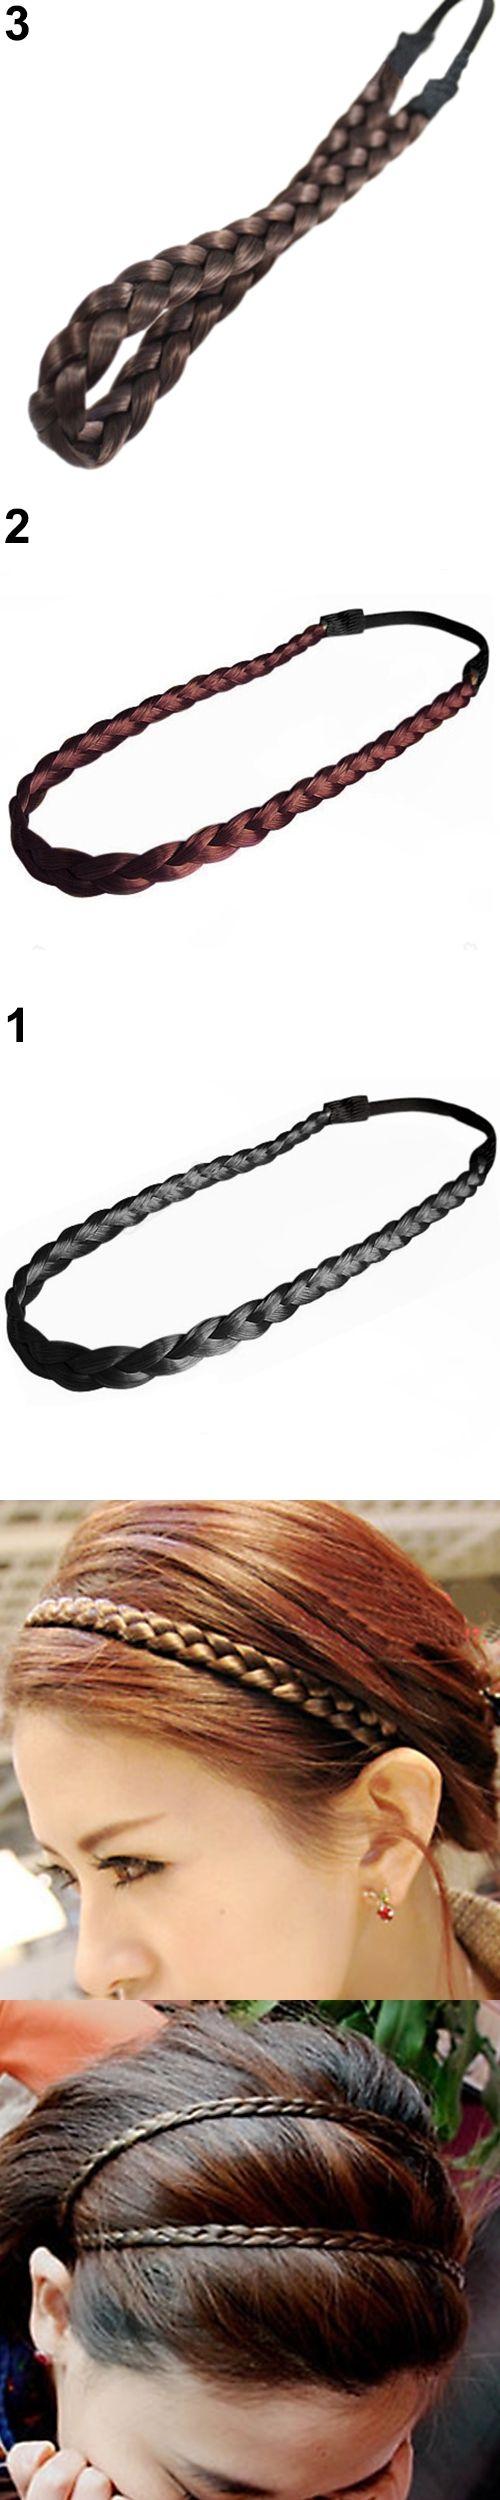 Hot 4 Colors Braided Stretch Elastic Hair Band Headband Barrette Sticker Accessories 5bpu 7ecb Pinterest Bands